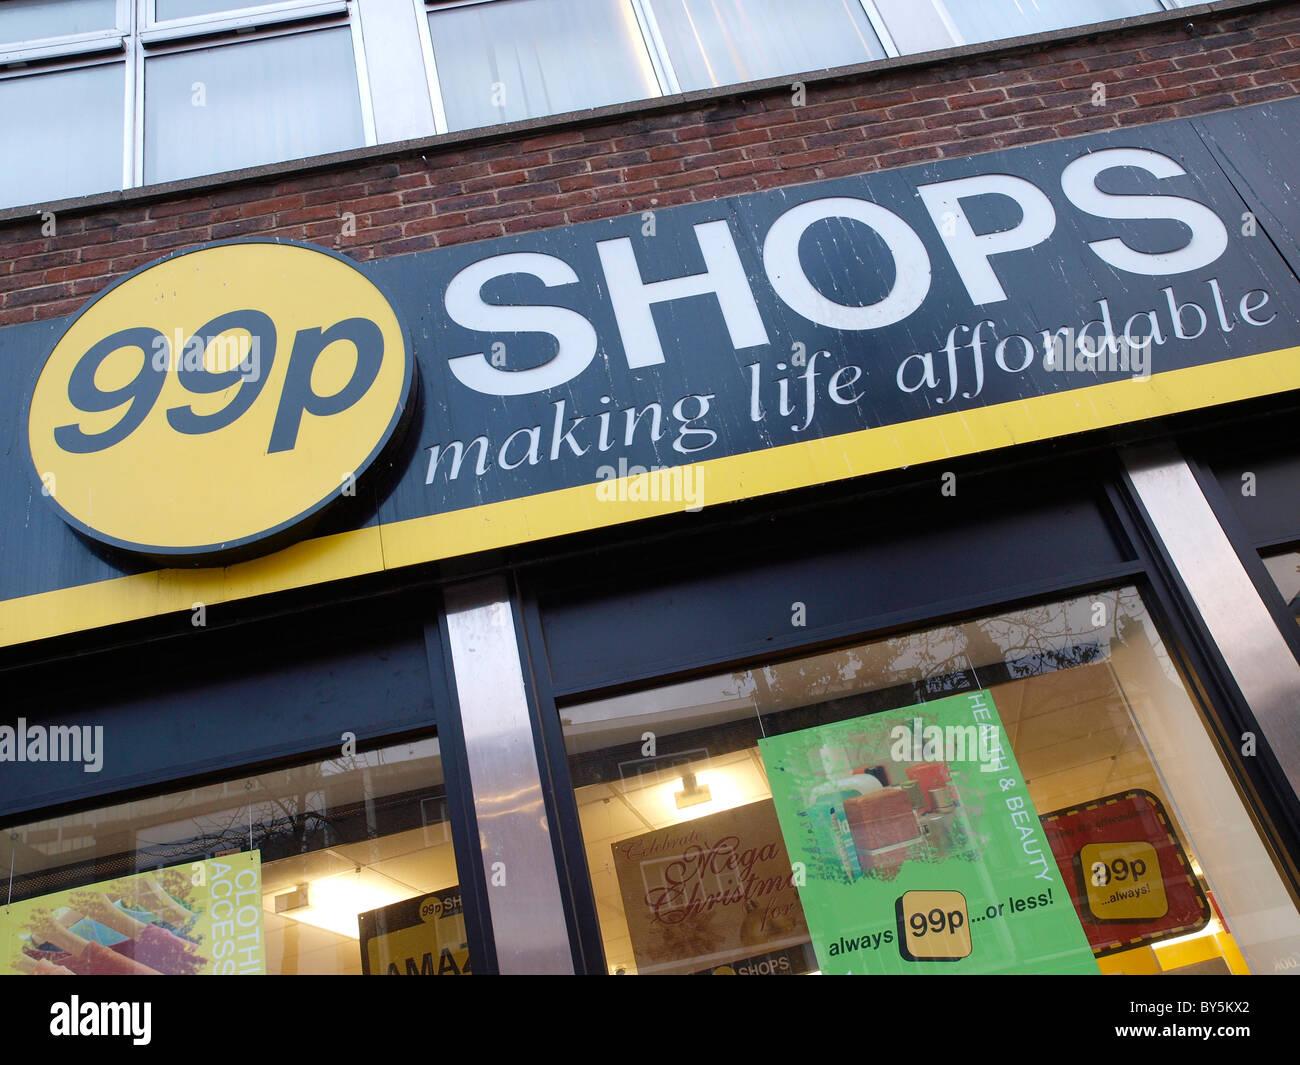 99p Shop in Lewisham London England - Stock Image